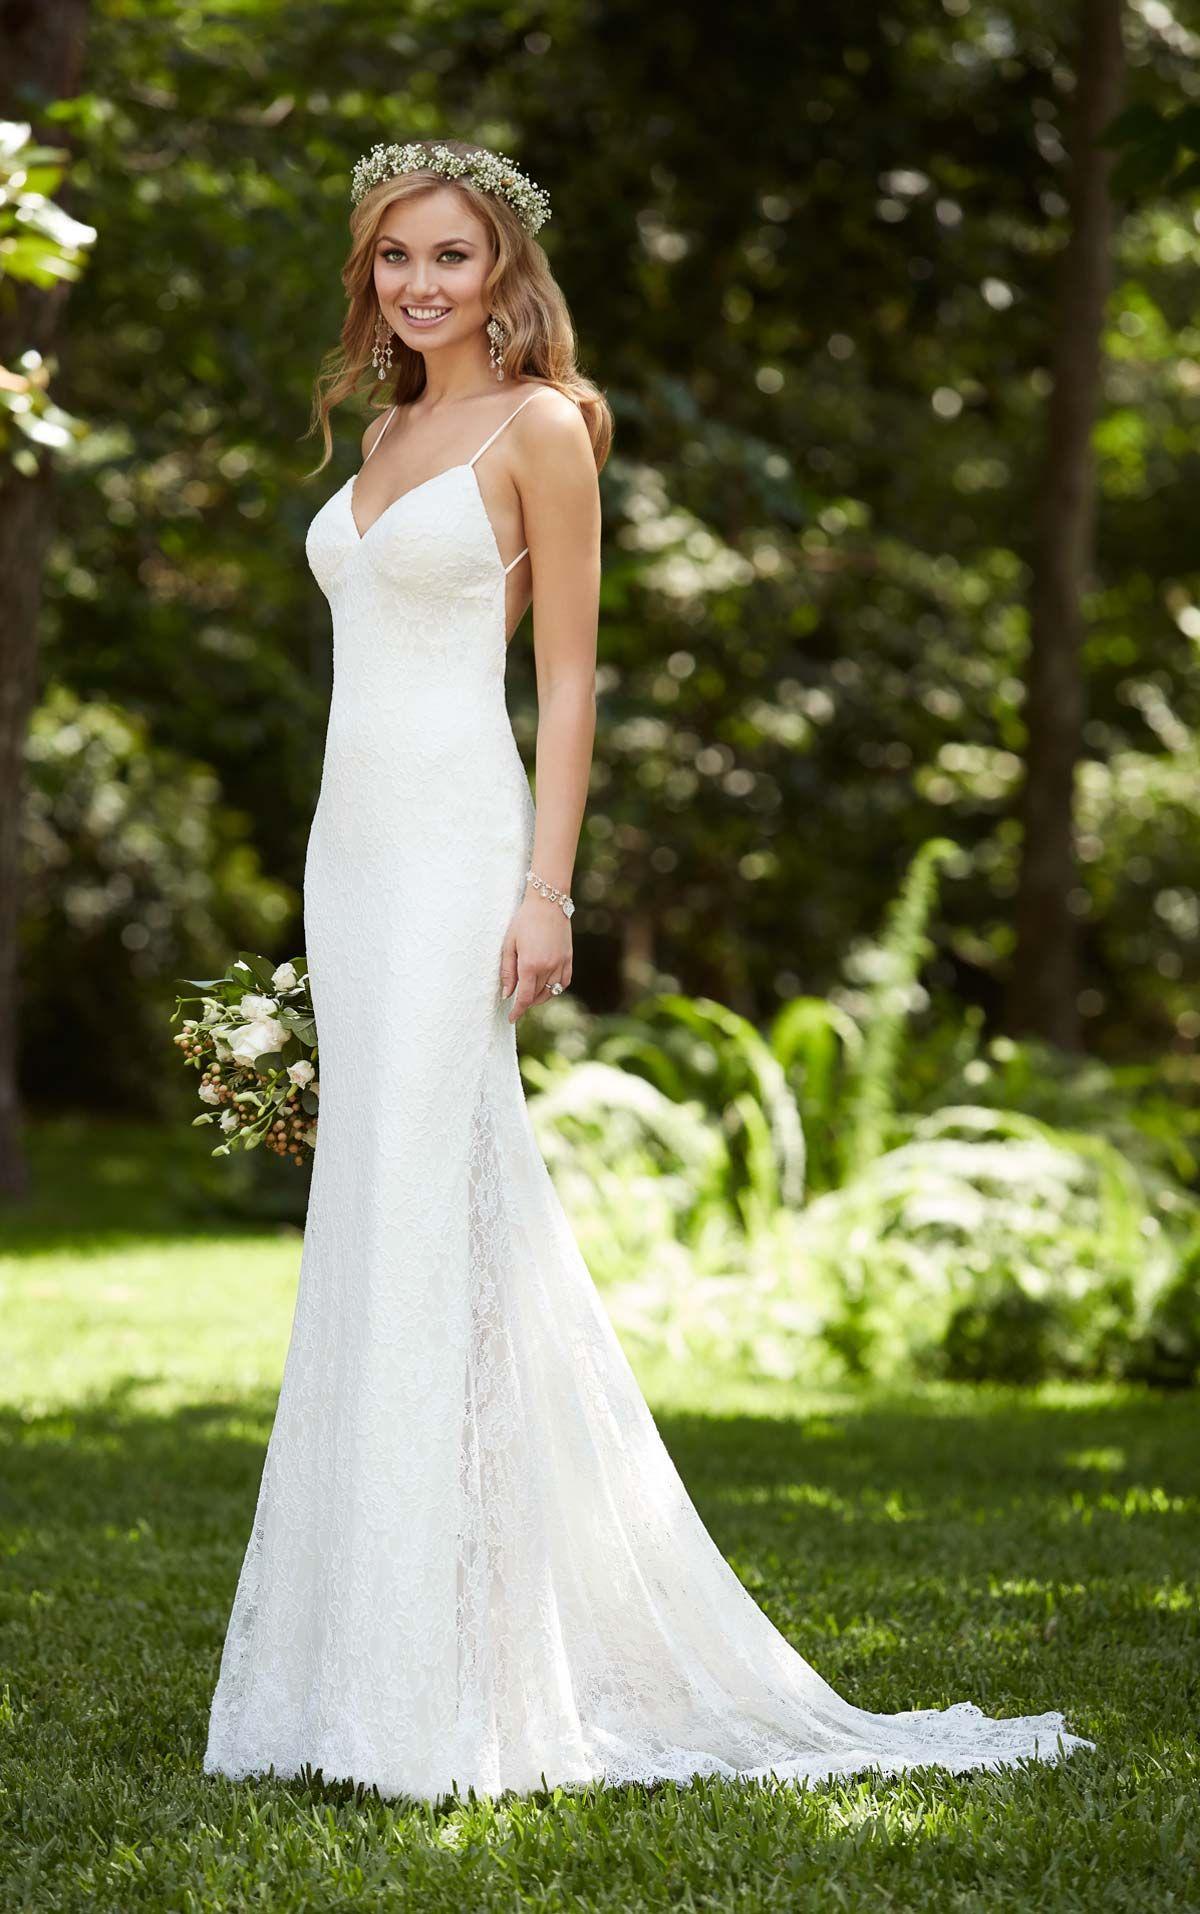 Brautkleid mit atemberaubend tiefem Rückenausschnitt